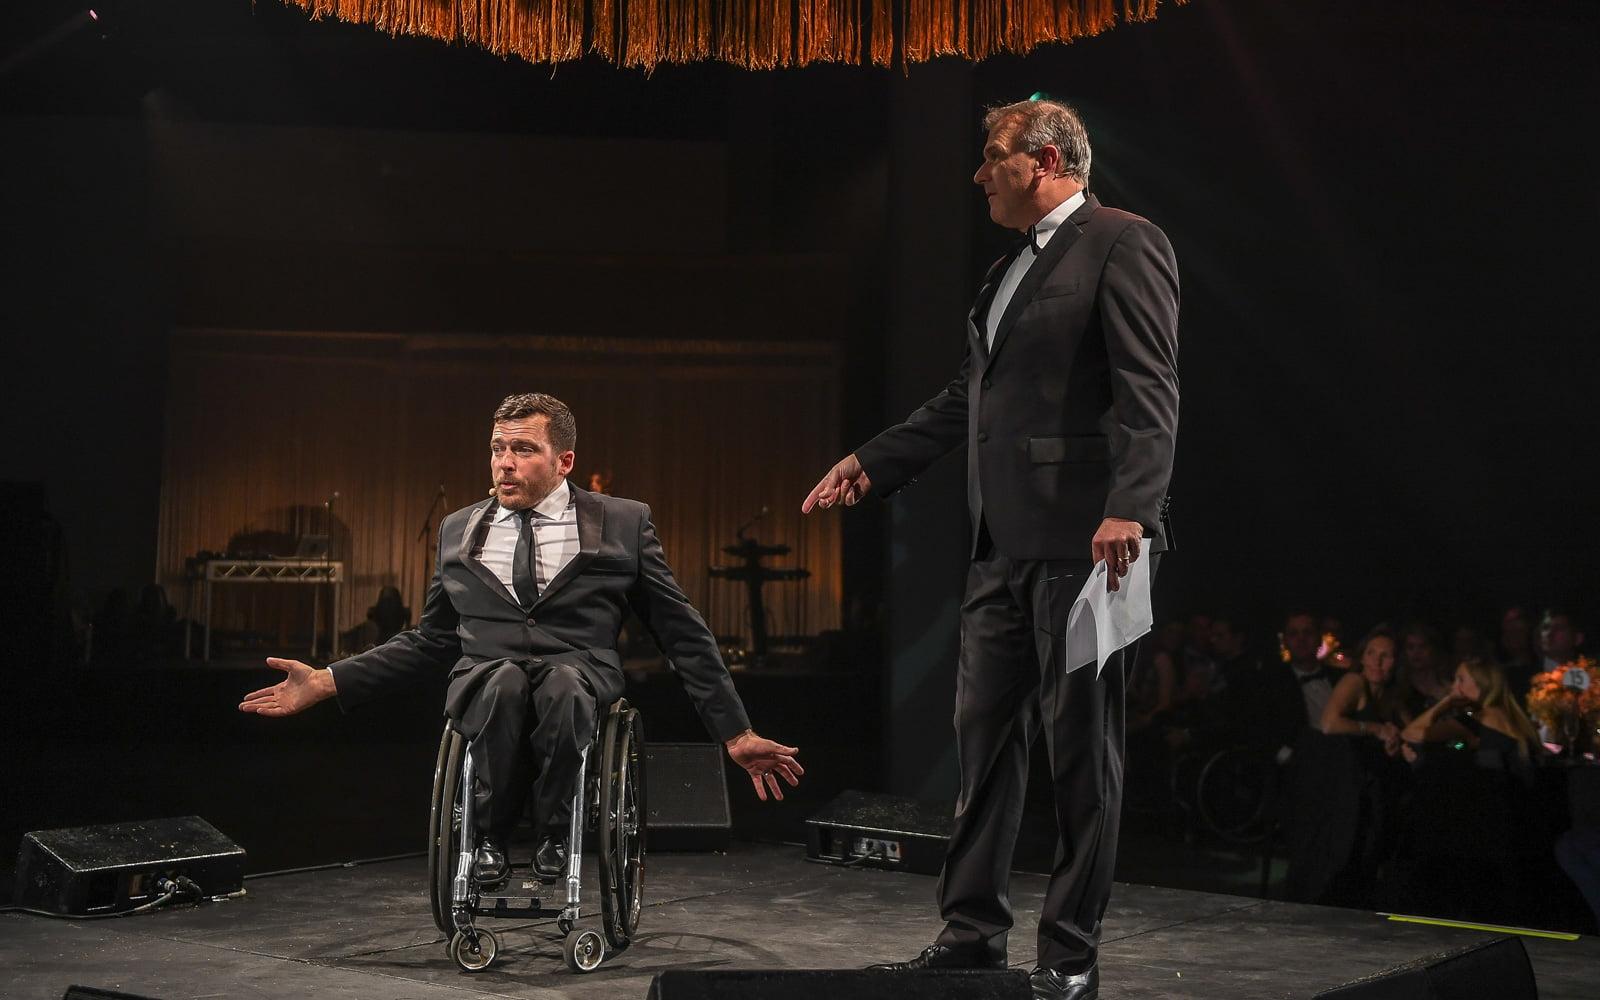 Paralympics Australia awarded for Infinite Possibilities Gala